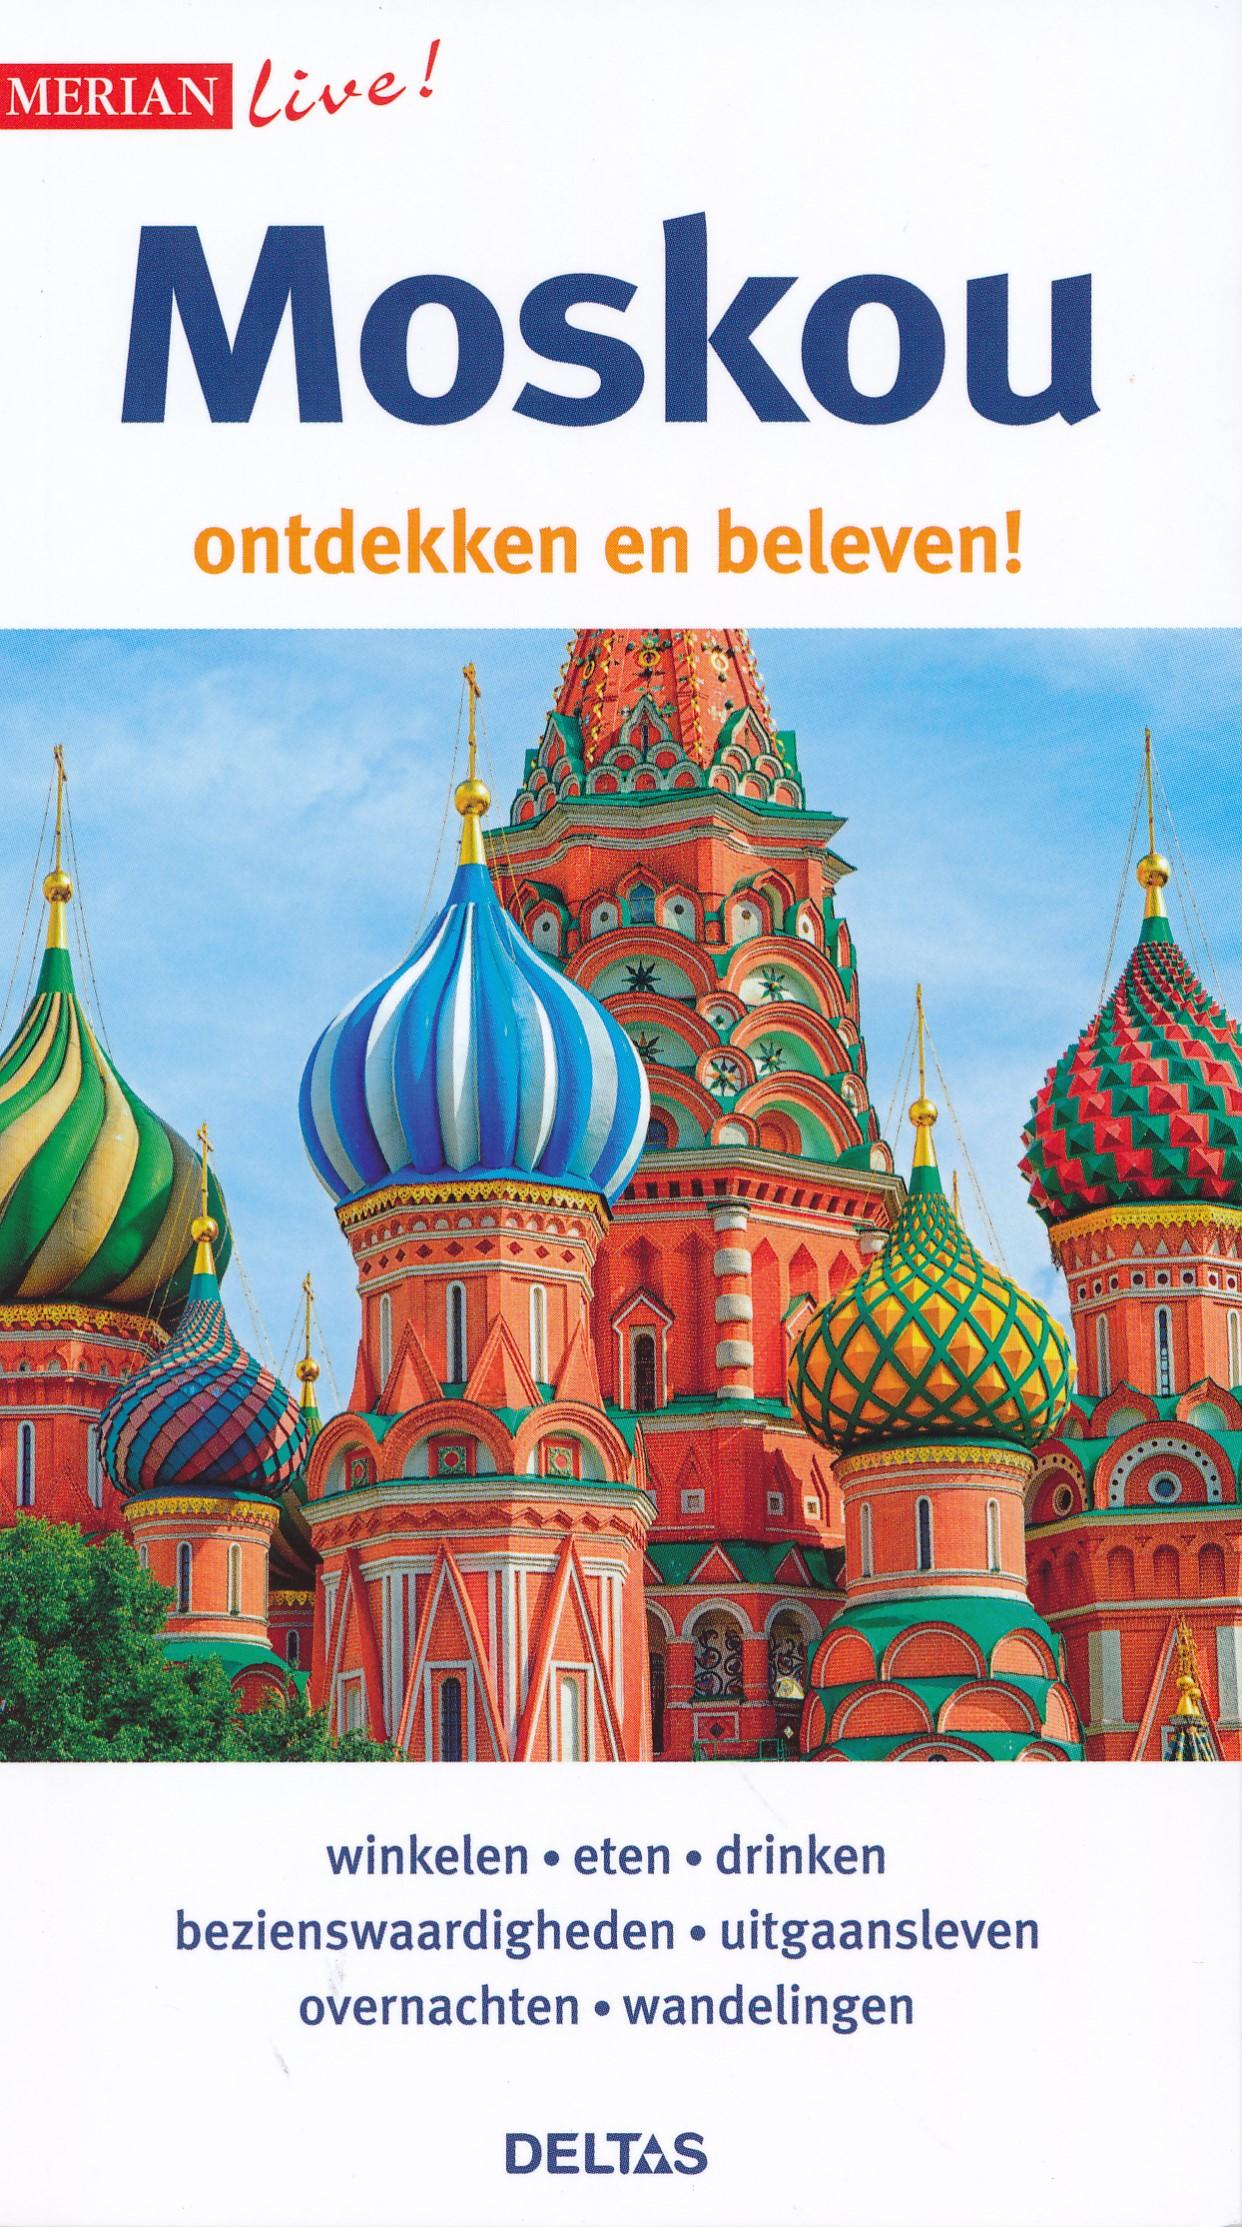 Reisgids Merian live Moskou   Deltas de zwerver